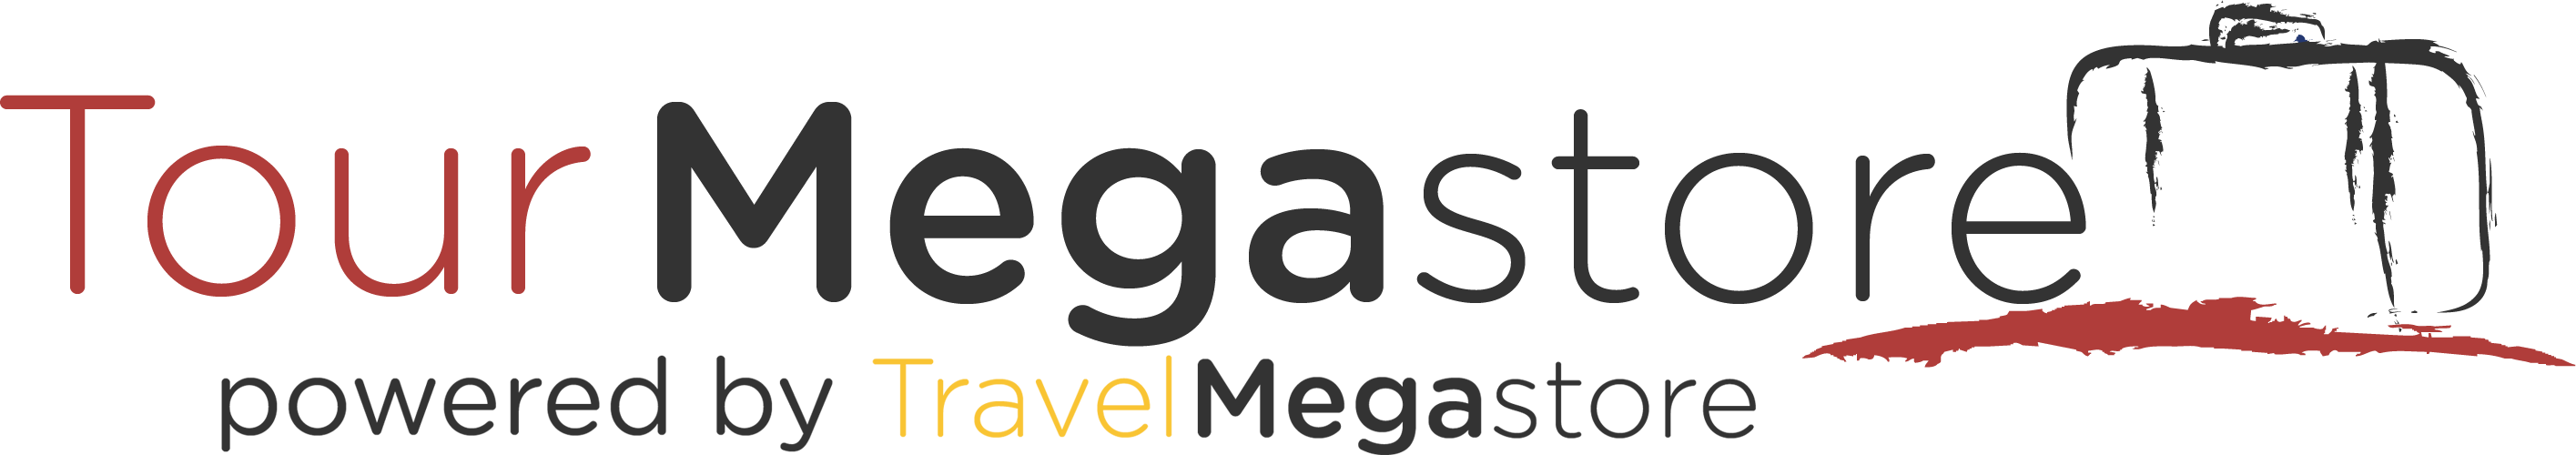 Tour Megastore